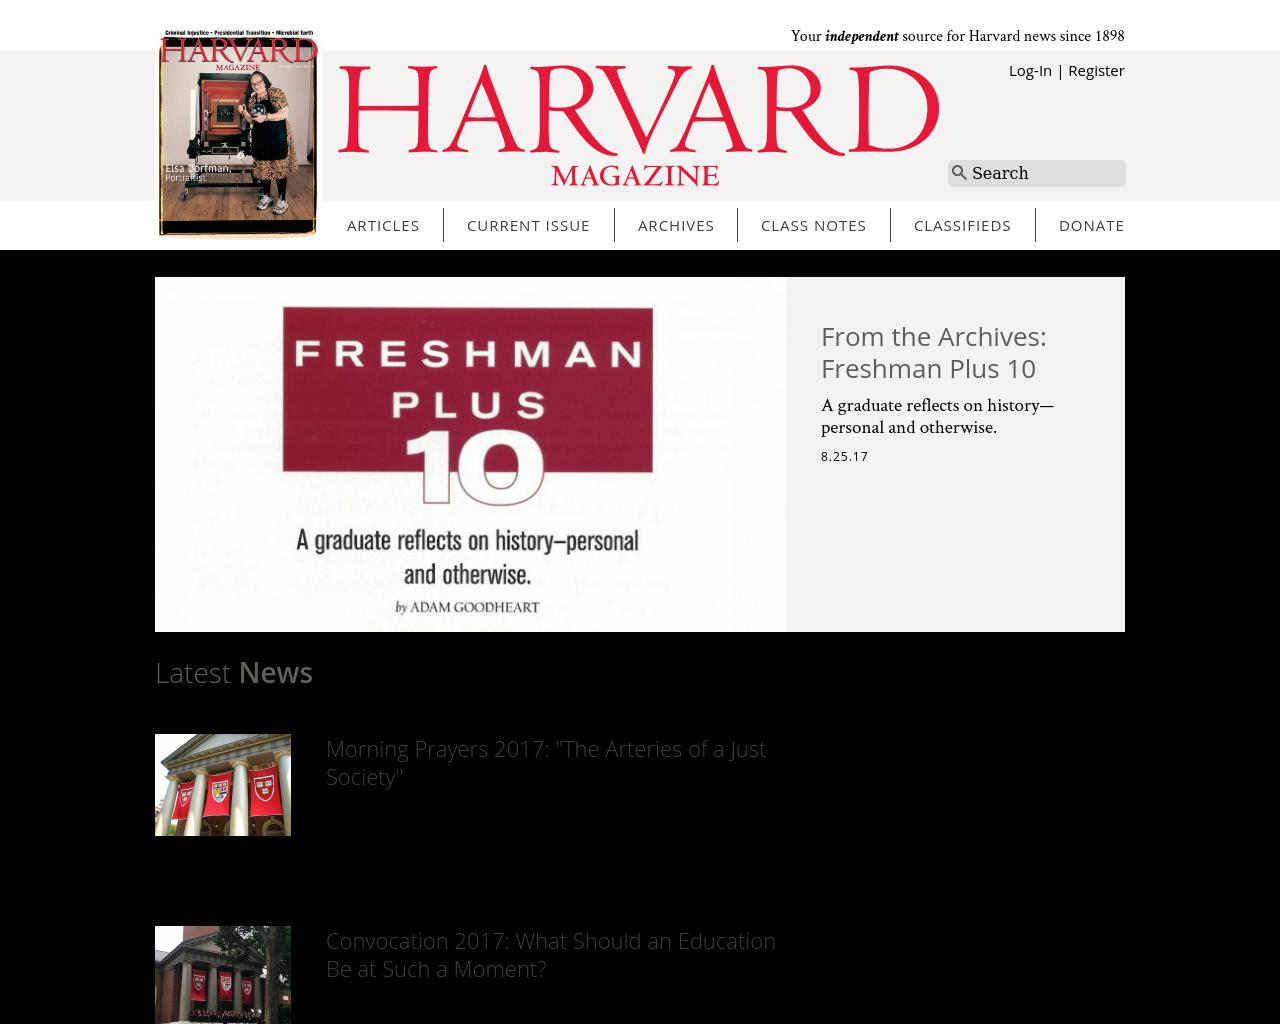 Harvard-Magazine-Advertising-Reviews-Pricing